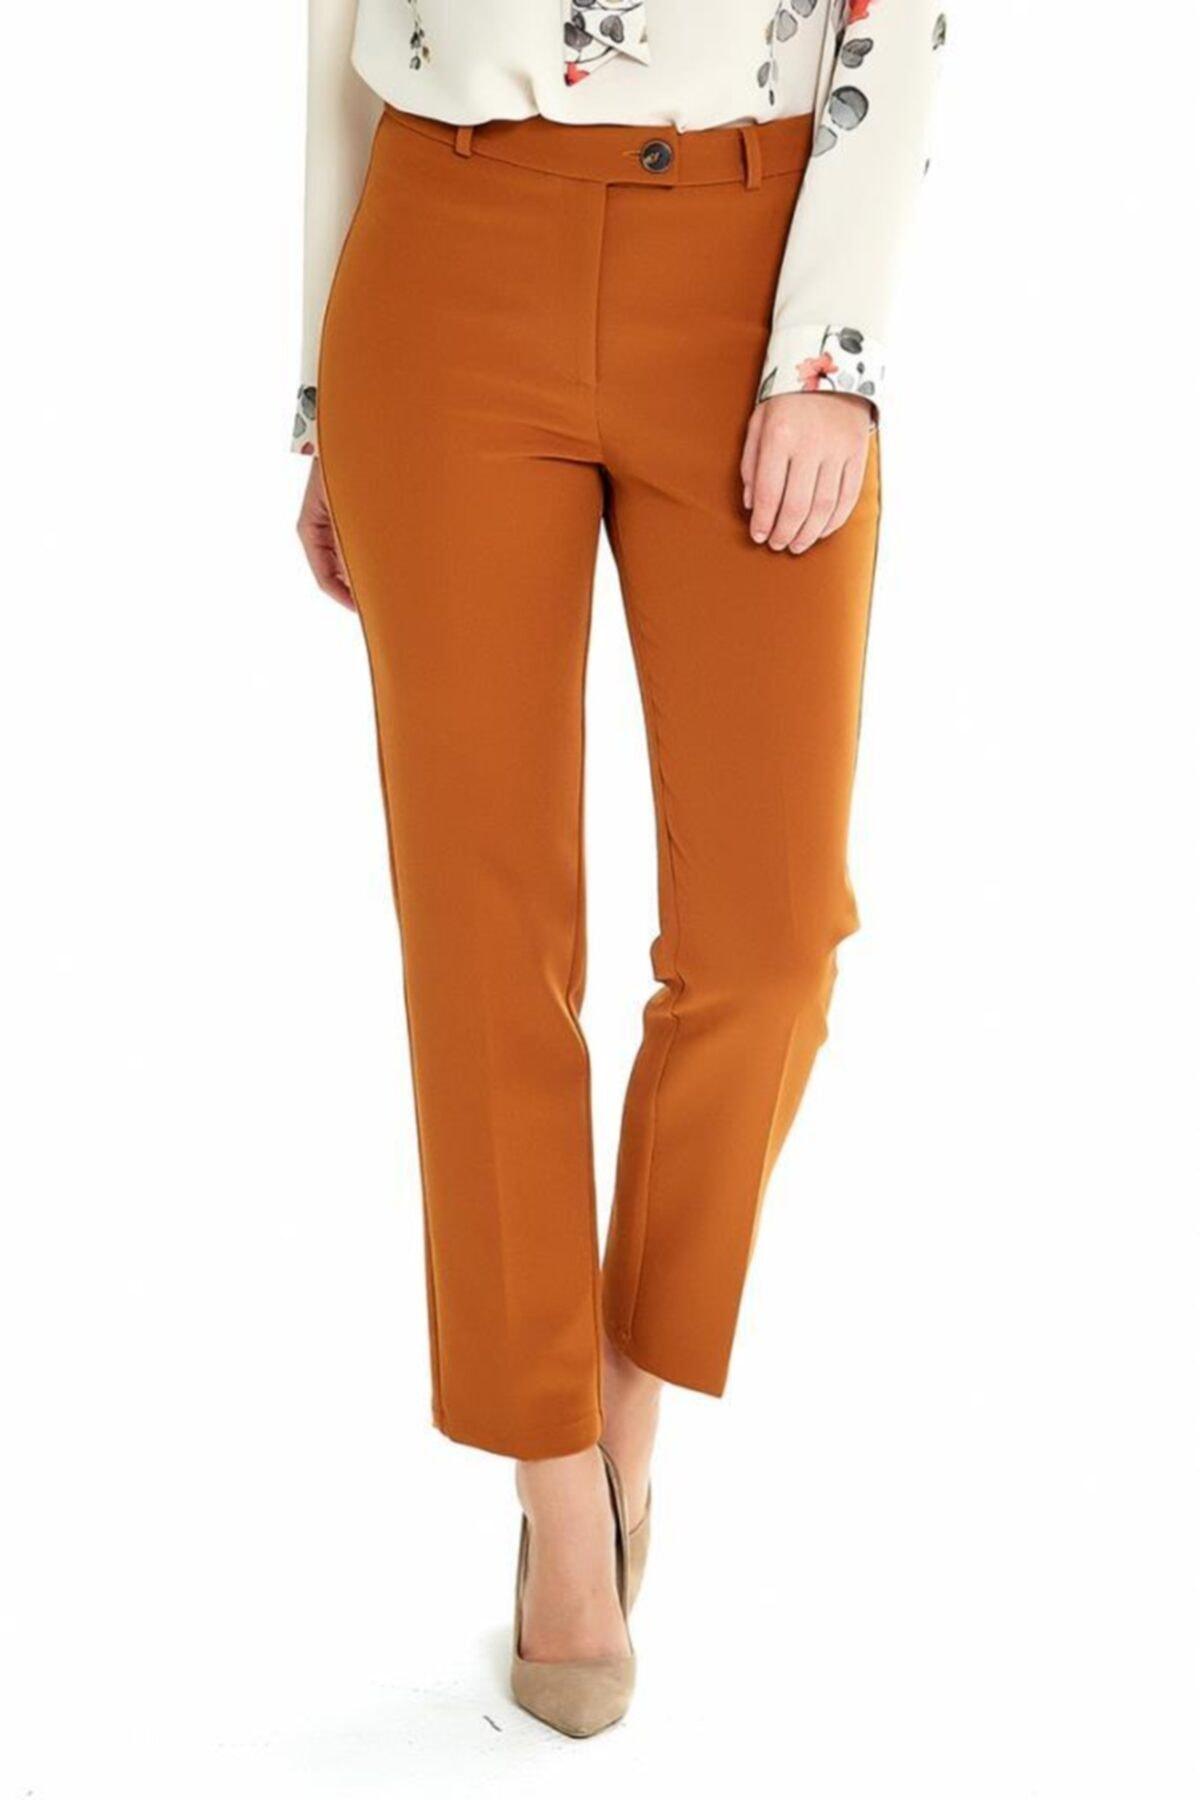 İKİLER Düğmeli Relax Fit Pantolon 1